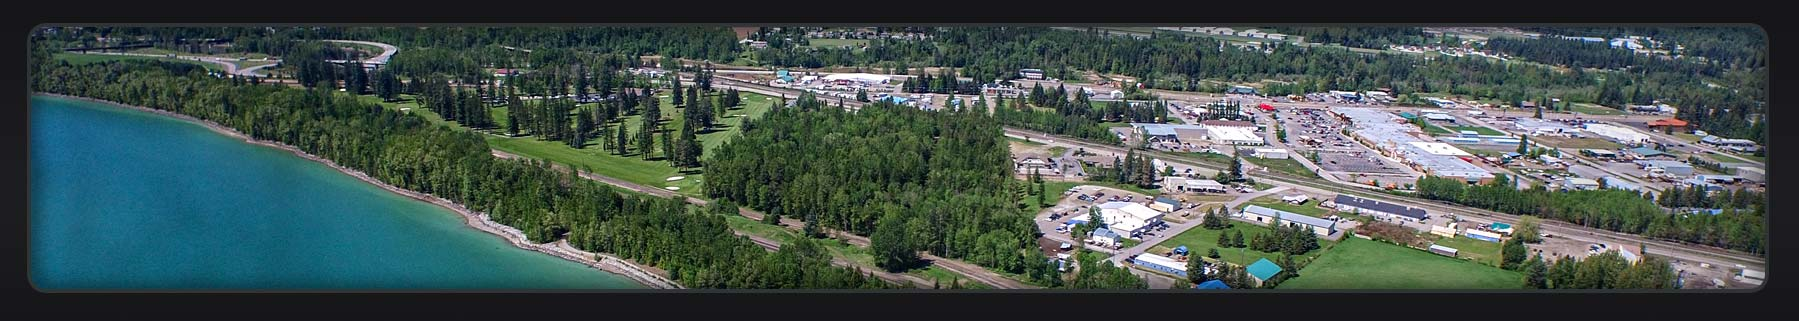 Ponderay, Idaho Real Estate Search Tool